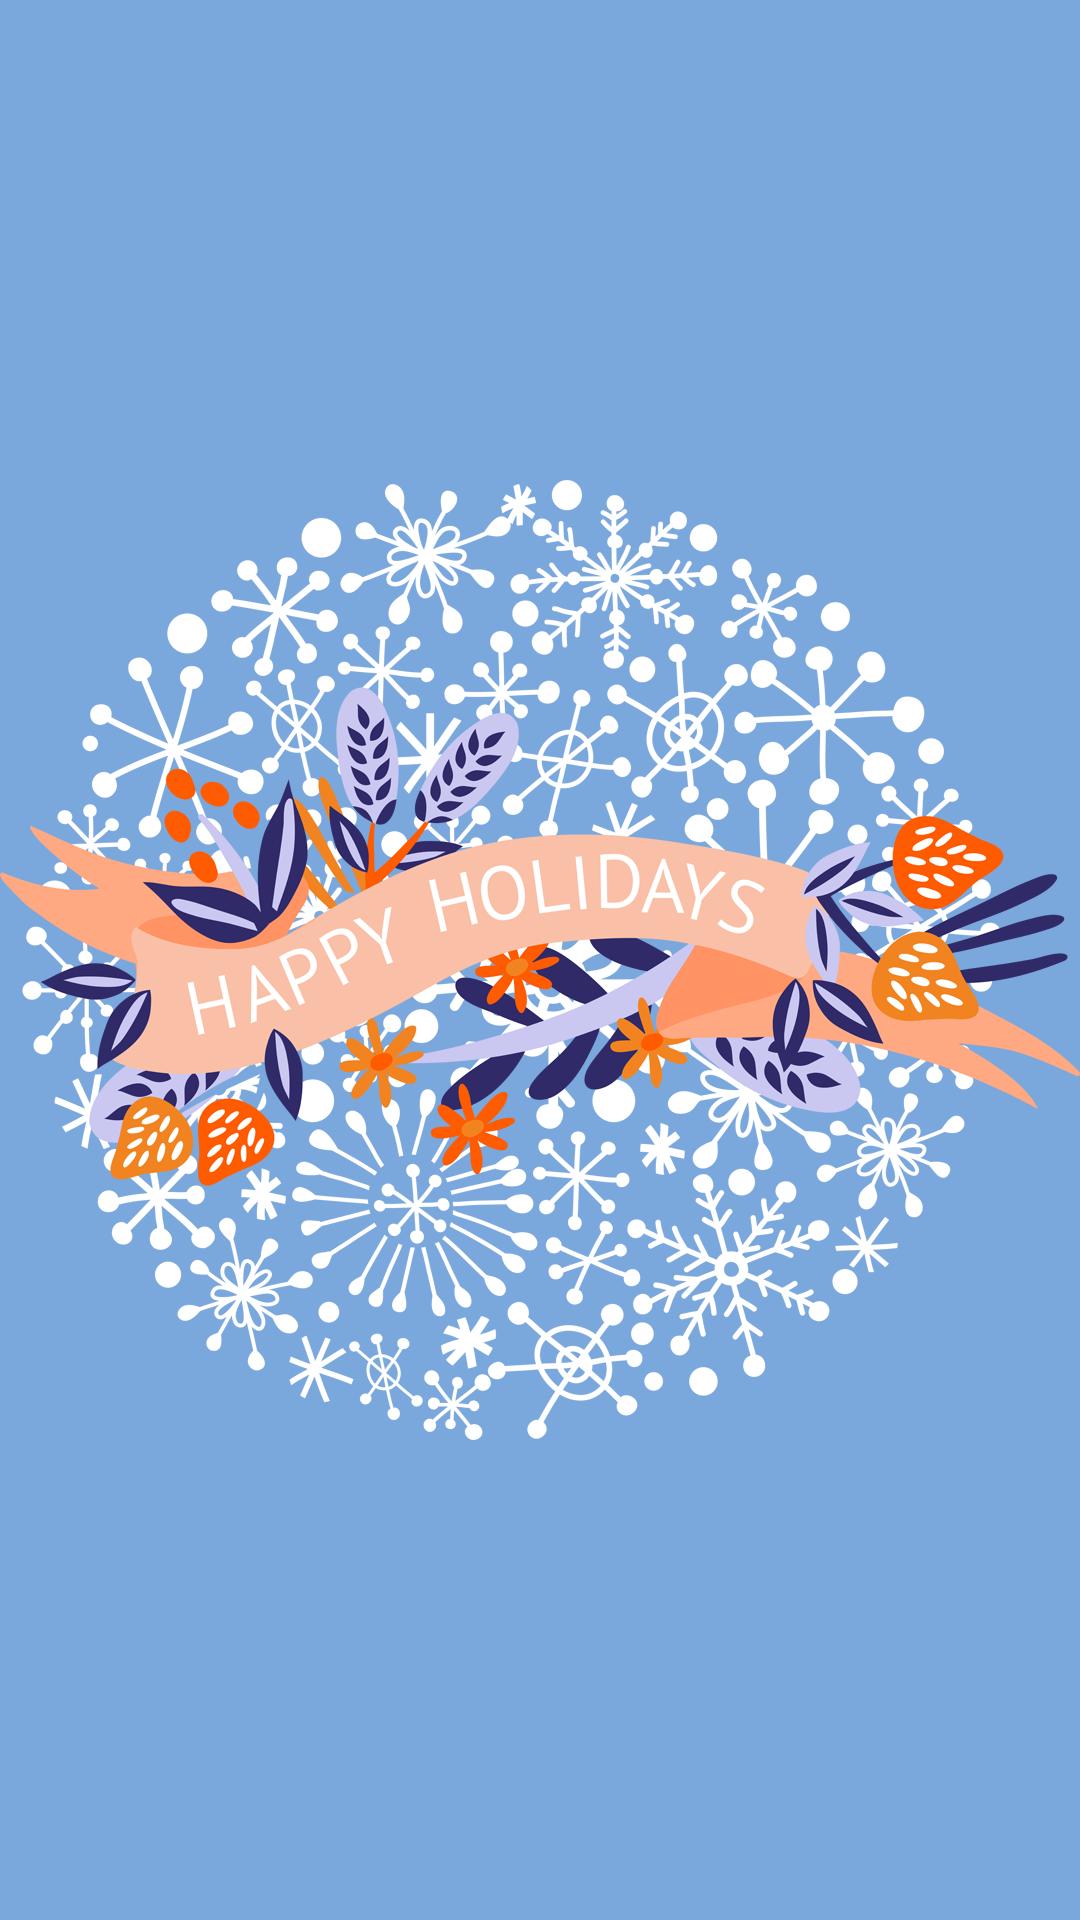 Happy Holidays Wallpaper Iphone 1116120   HD Wallpaper Download 1080x1920